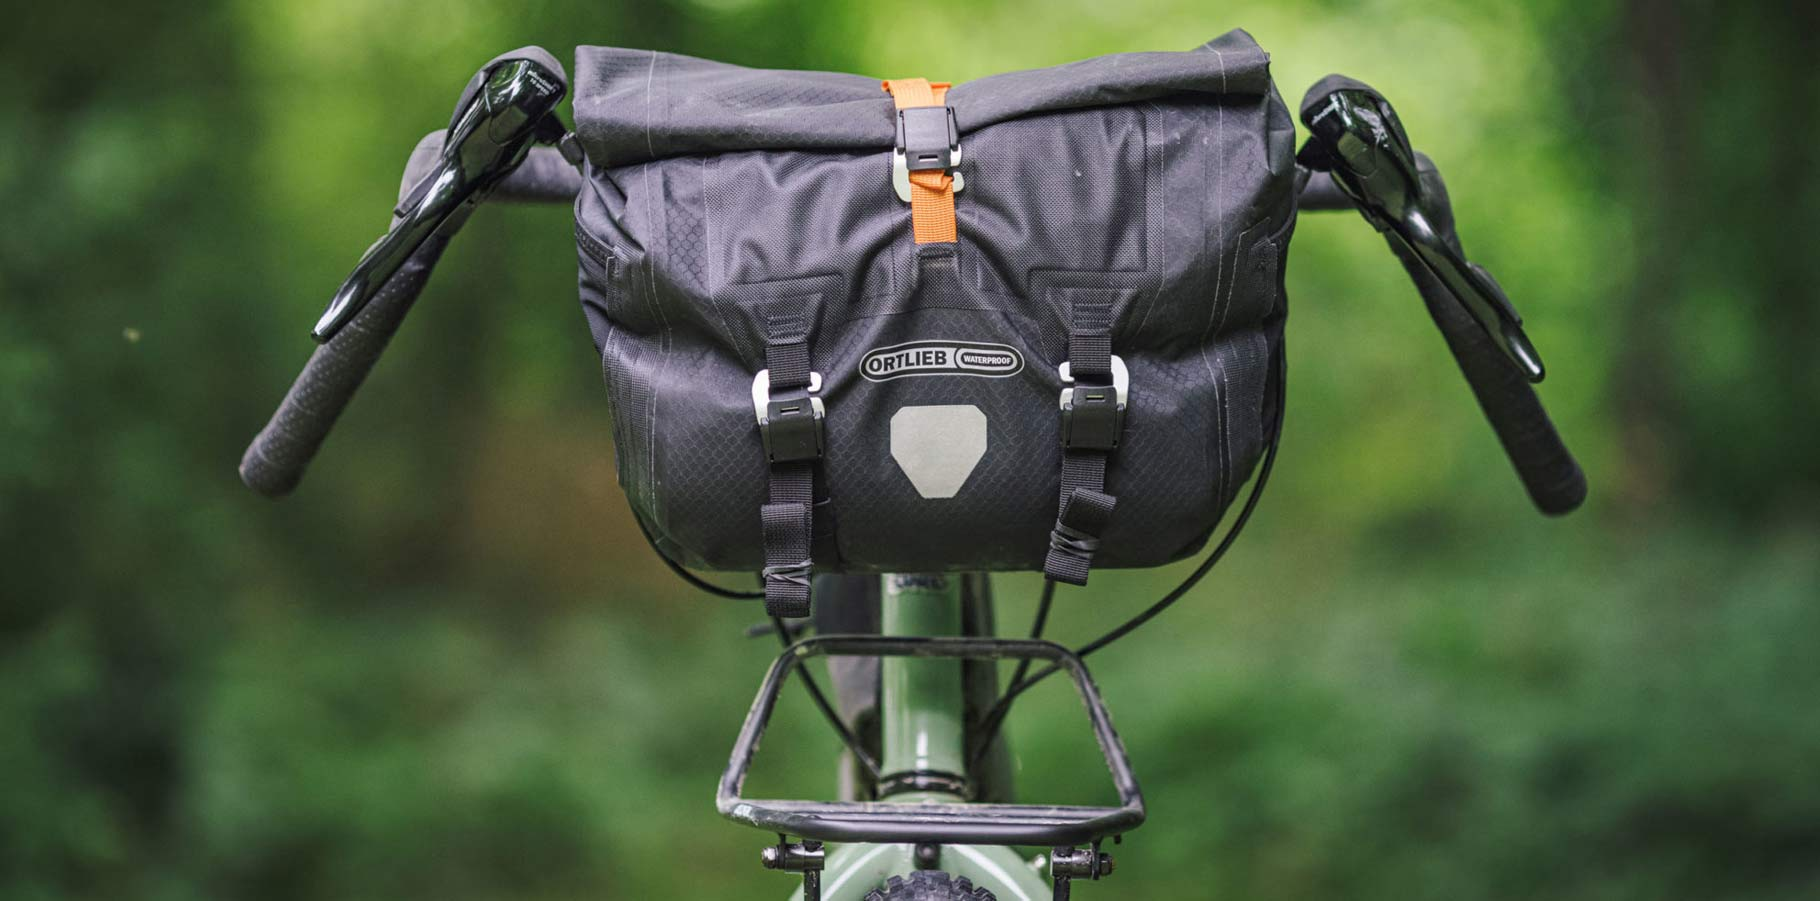 Ortlieb-Handlebar-pack-QR